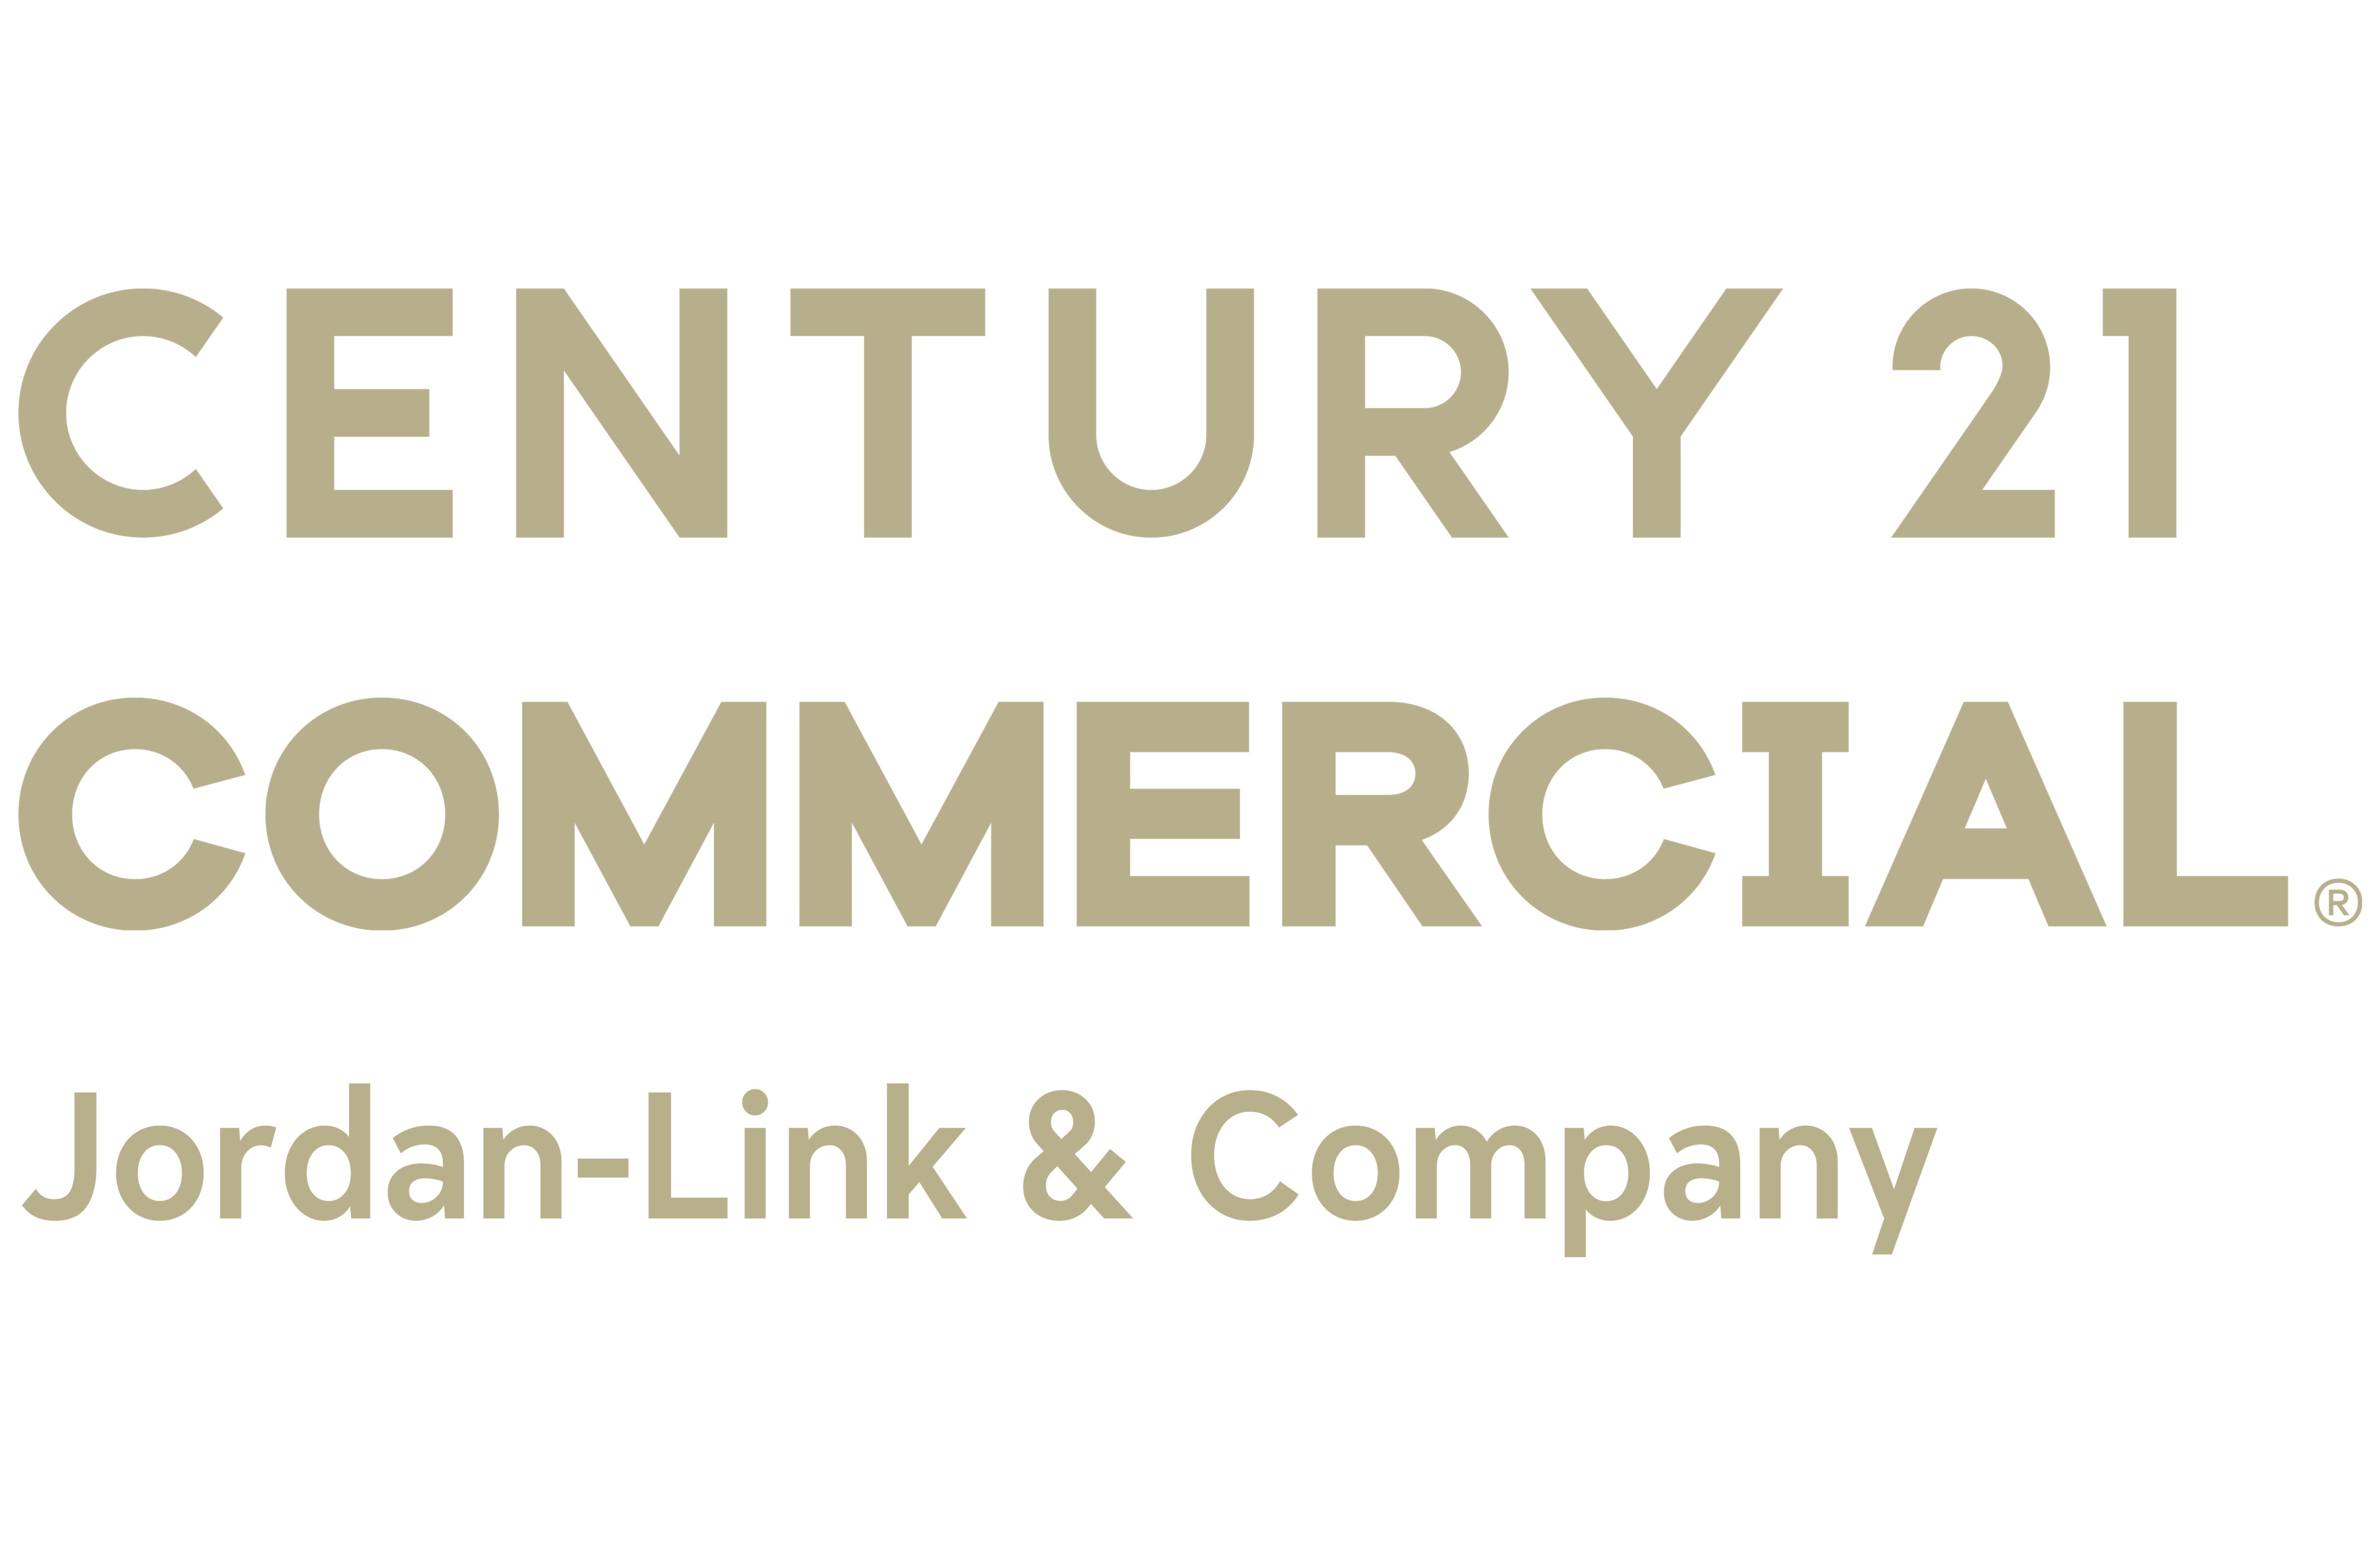 CENTURY 21 Jordan-Link & Company